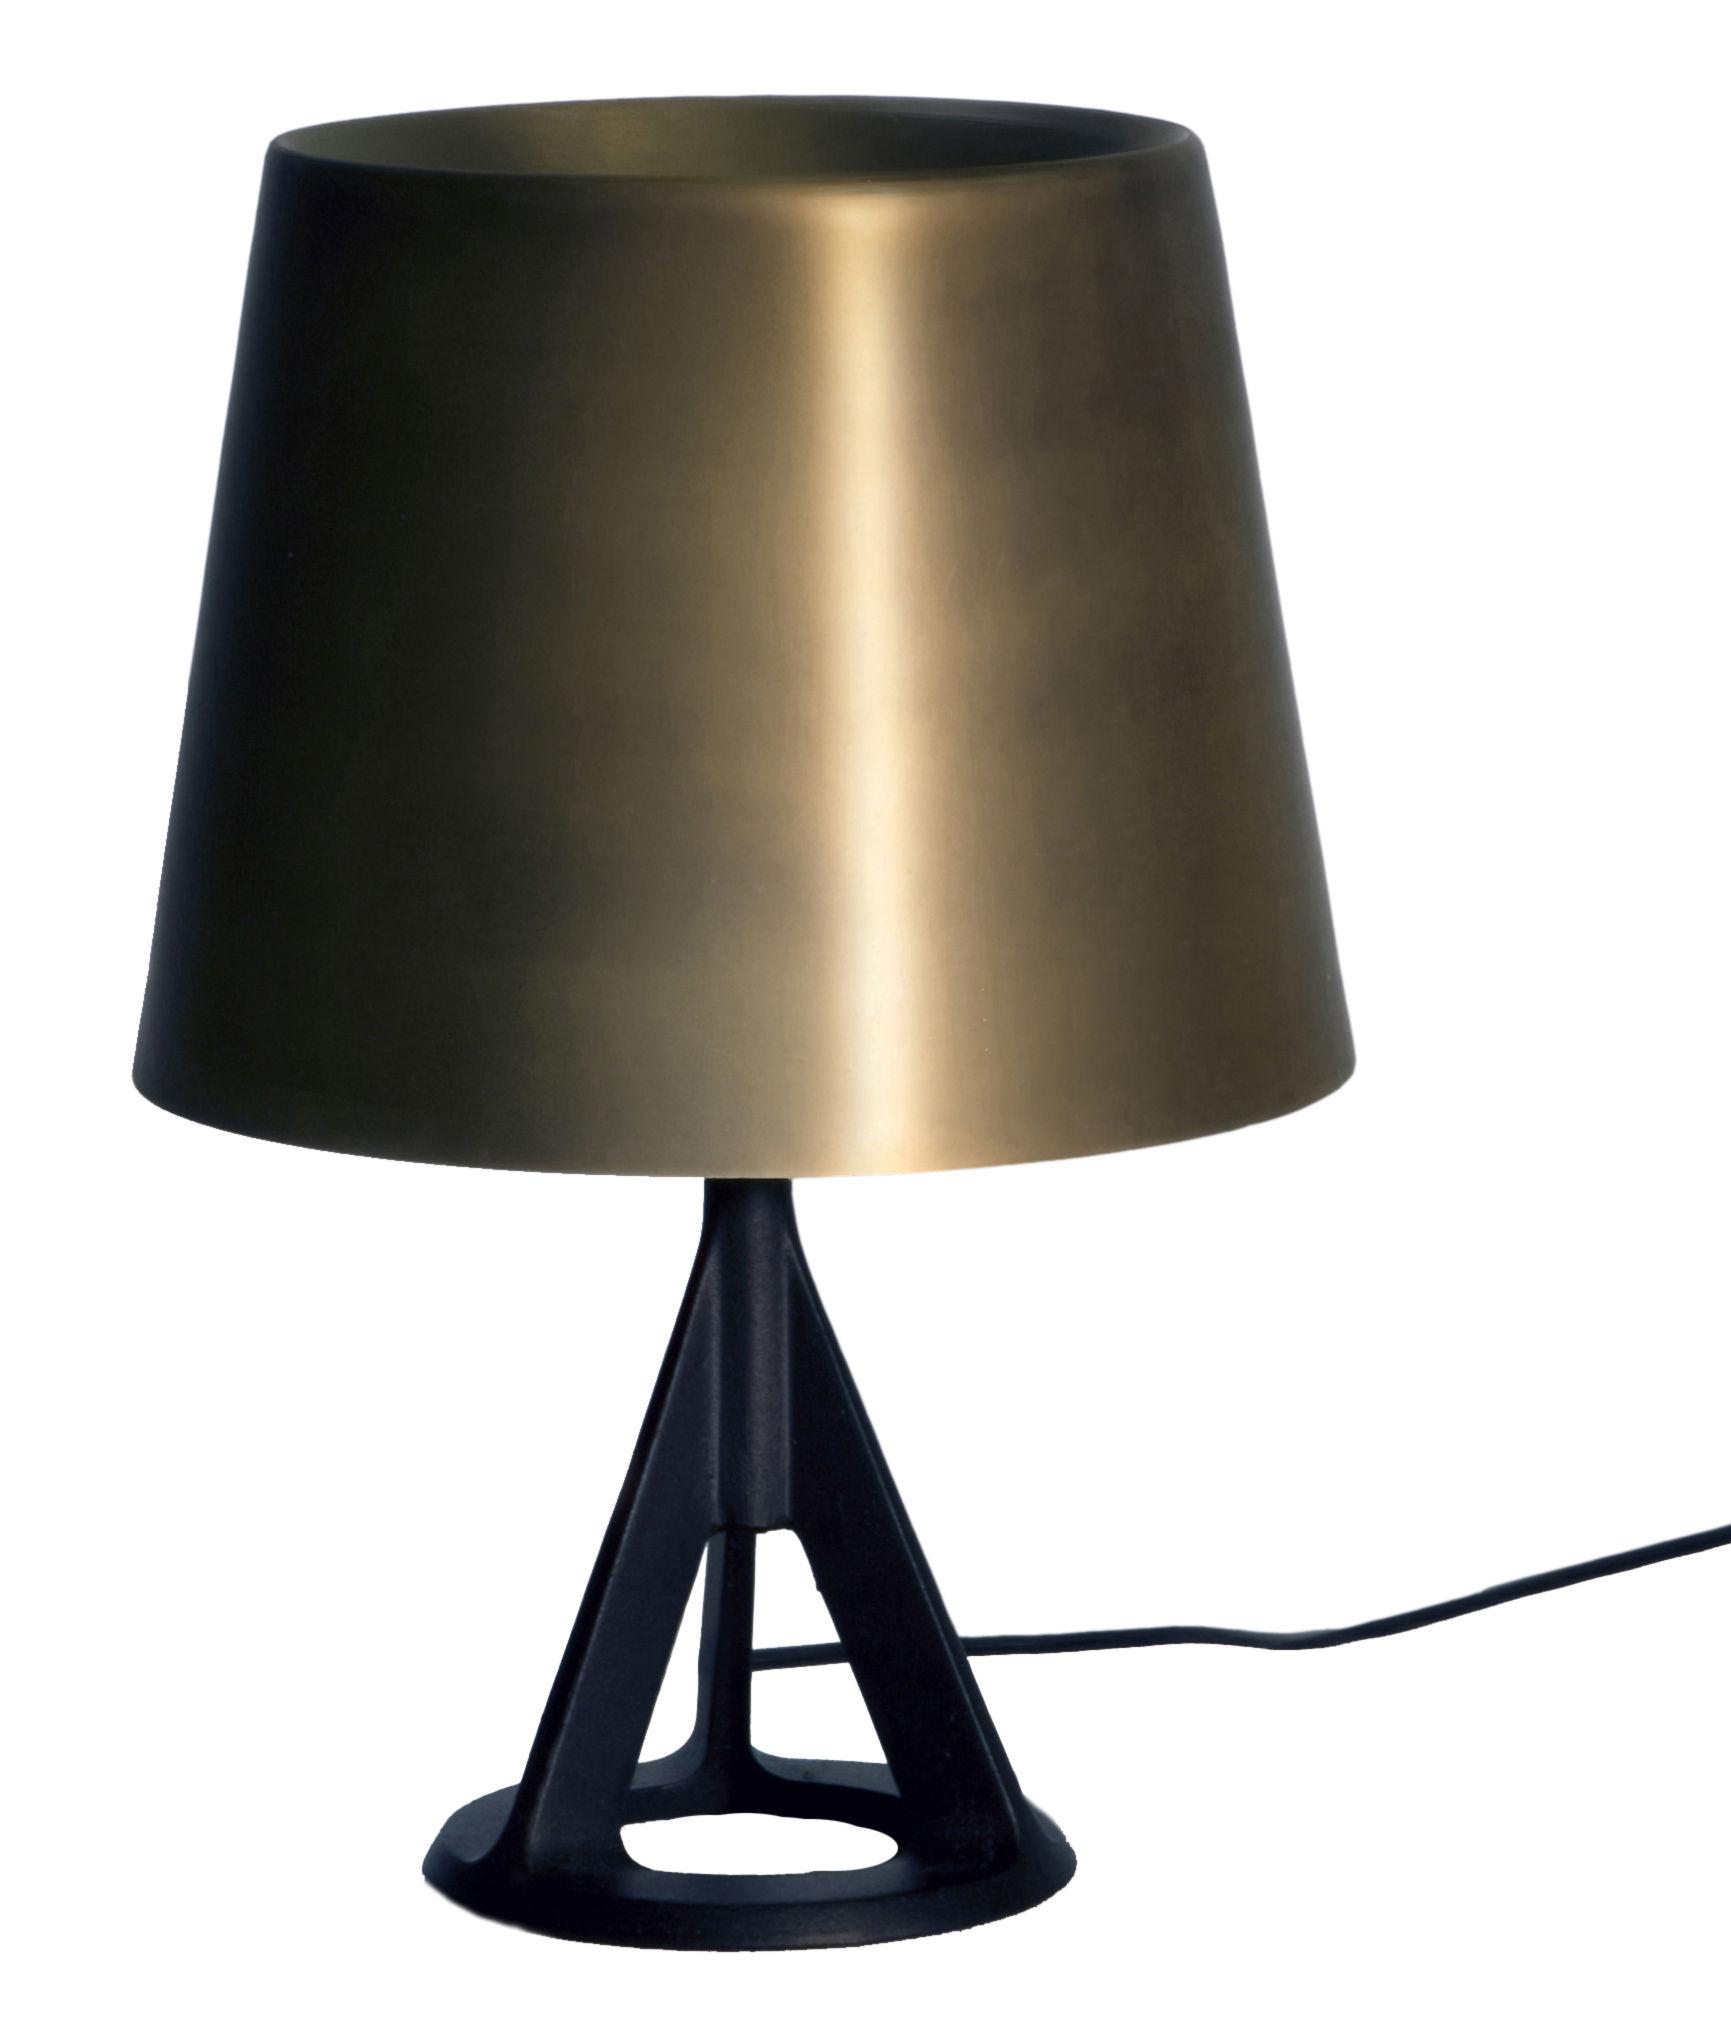 Lighting - Table Lamps - Base Table lamp by Tom Dixon - Matt Gold / black - Brushed brass, Cast iron